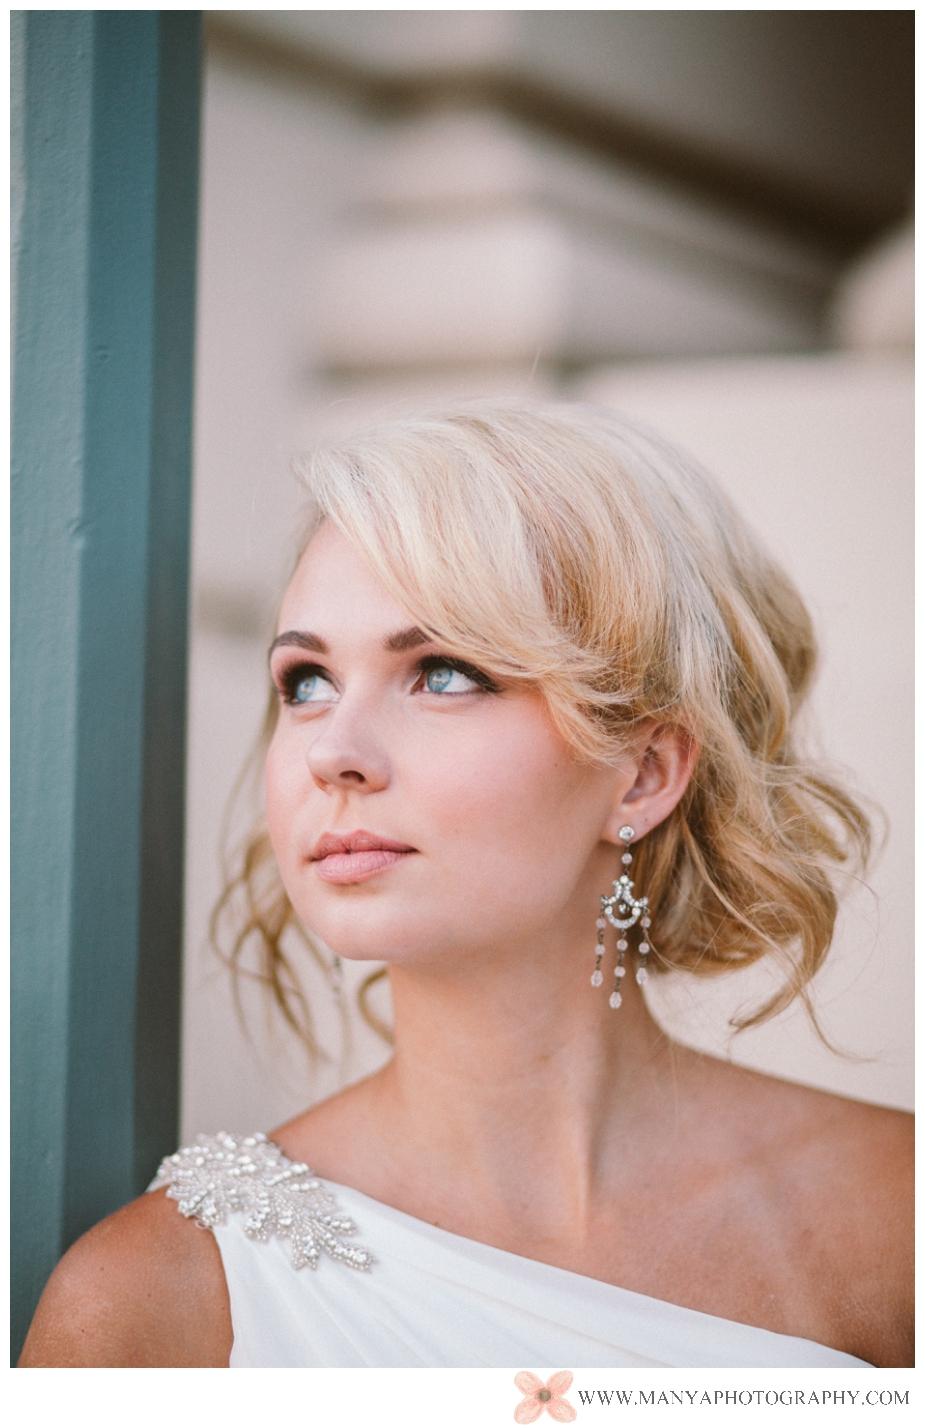 2013-07-31_0031 - Orange County Wedding Photographer